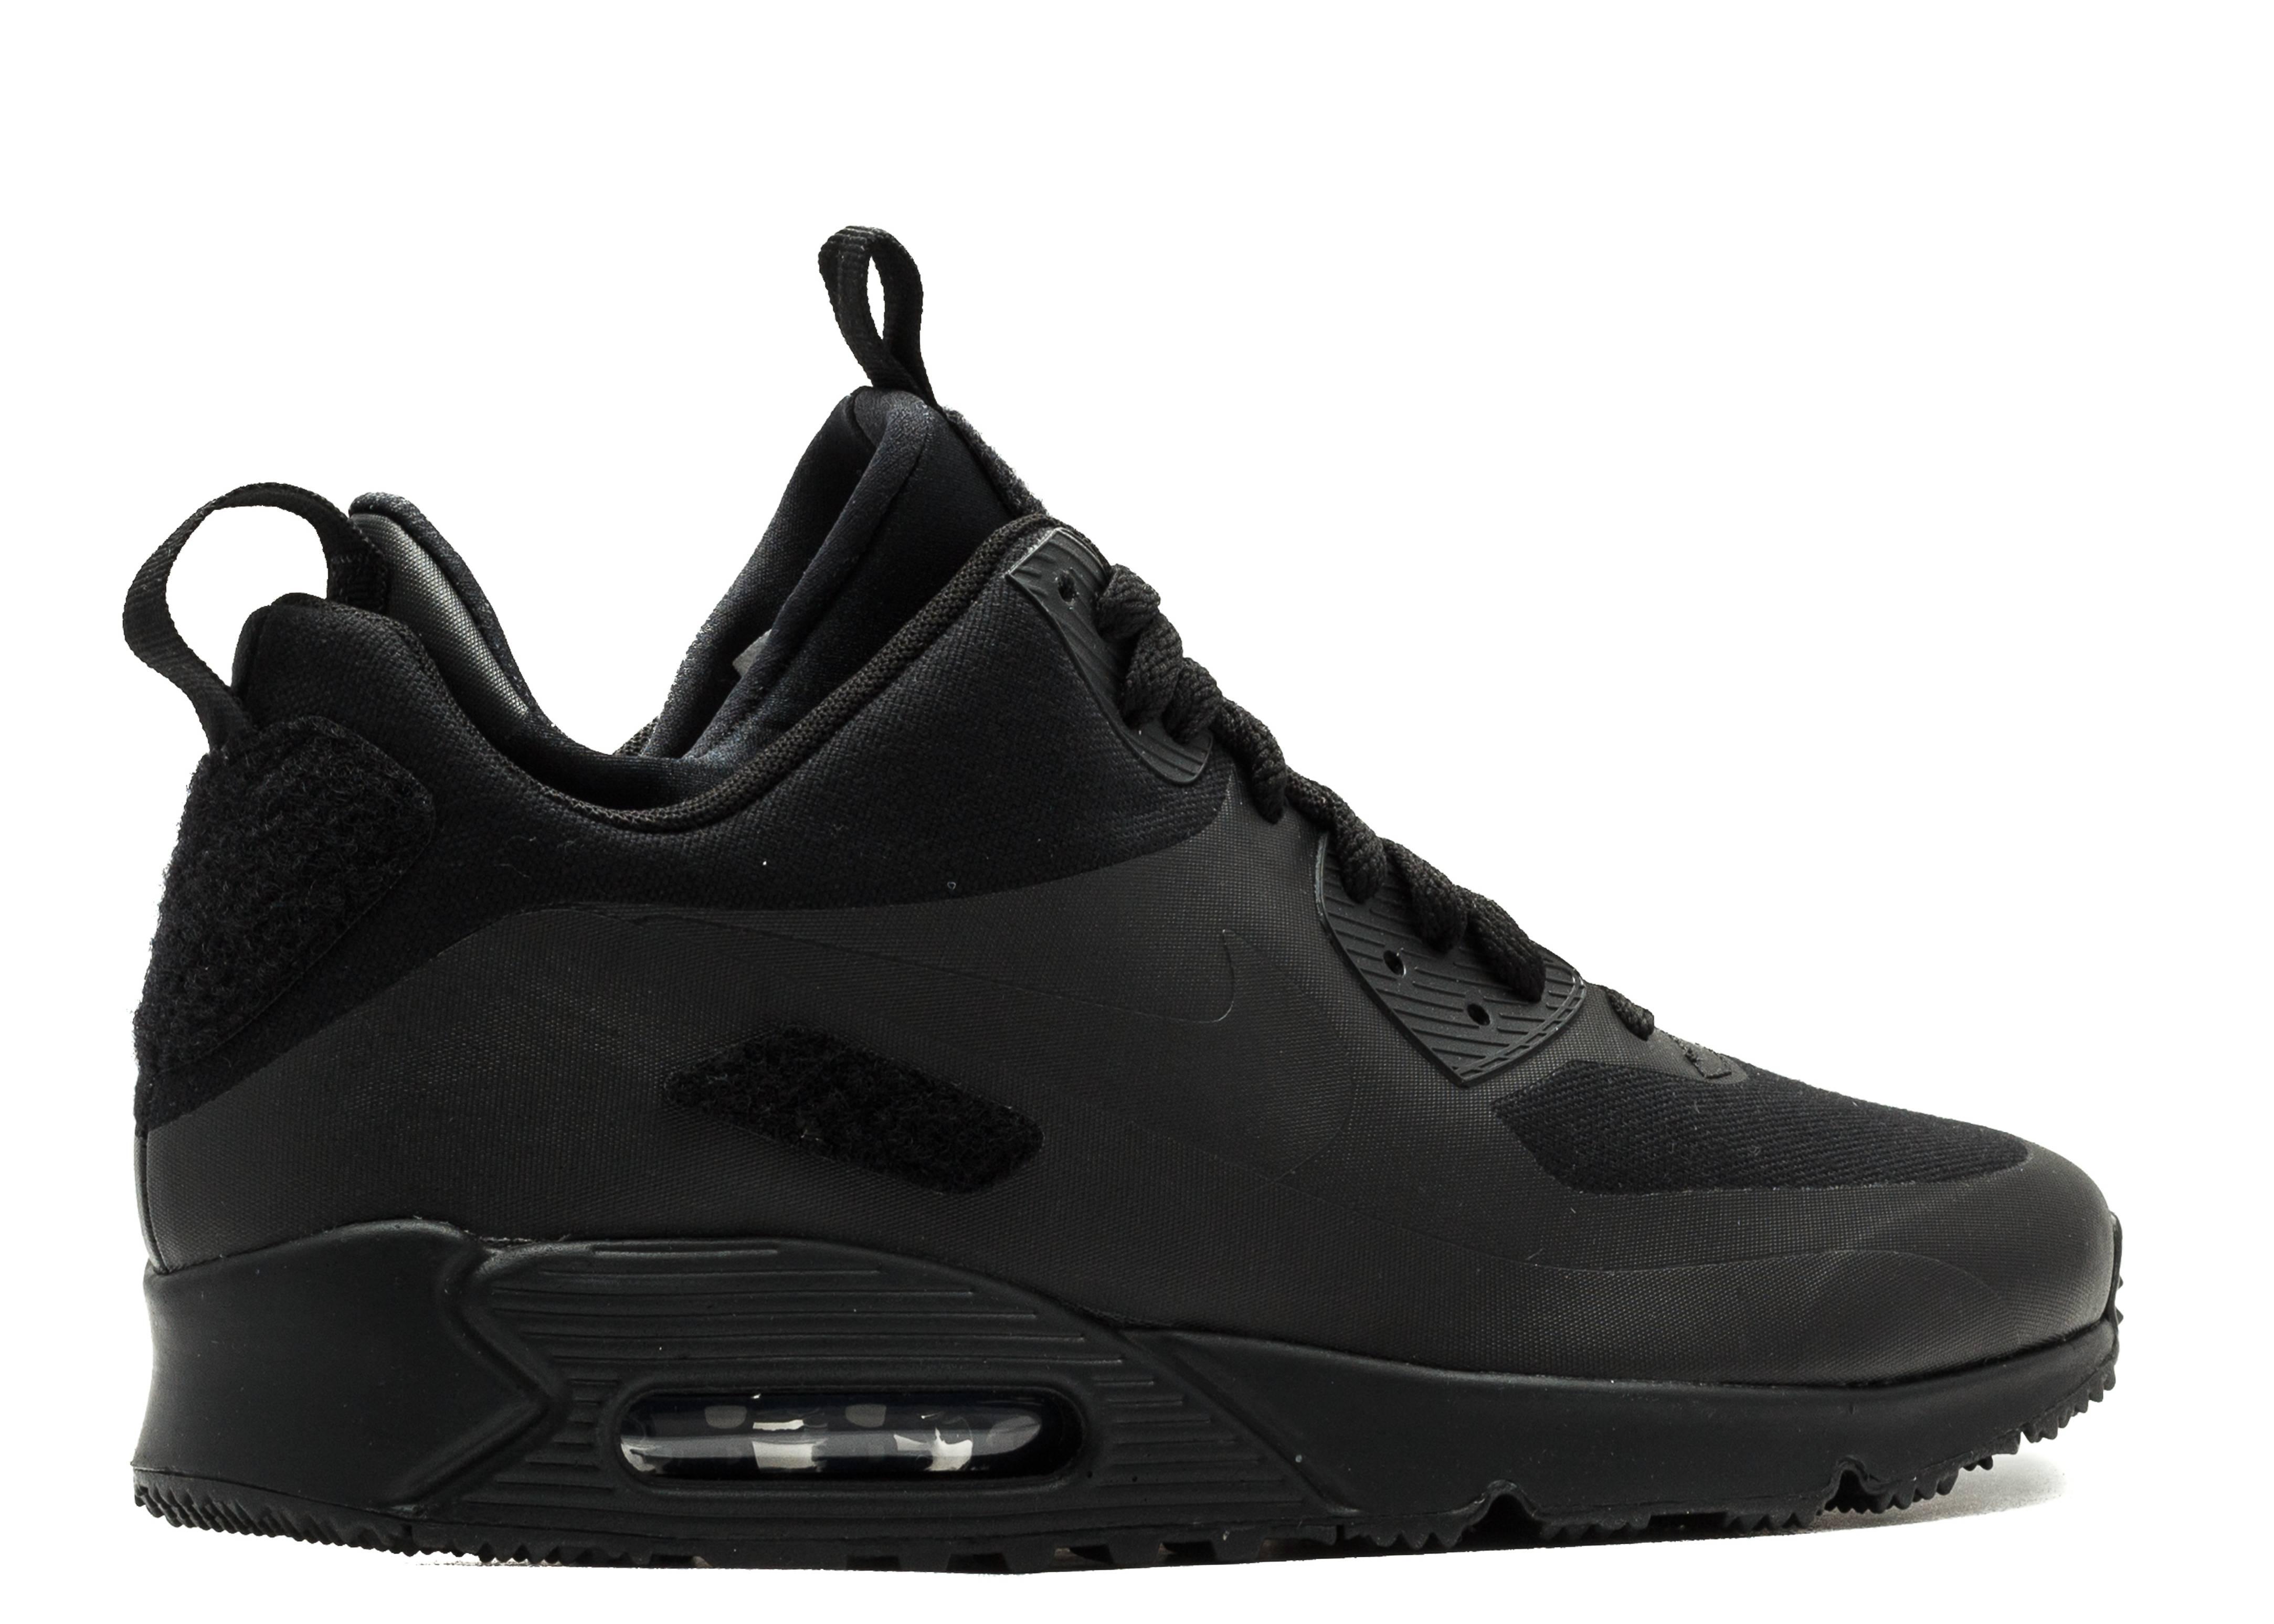 Air Max 90 Sneakerboot Sp Nike 704570 001 blackblack